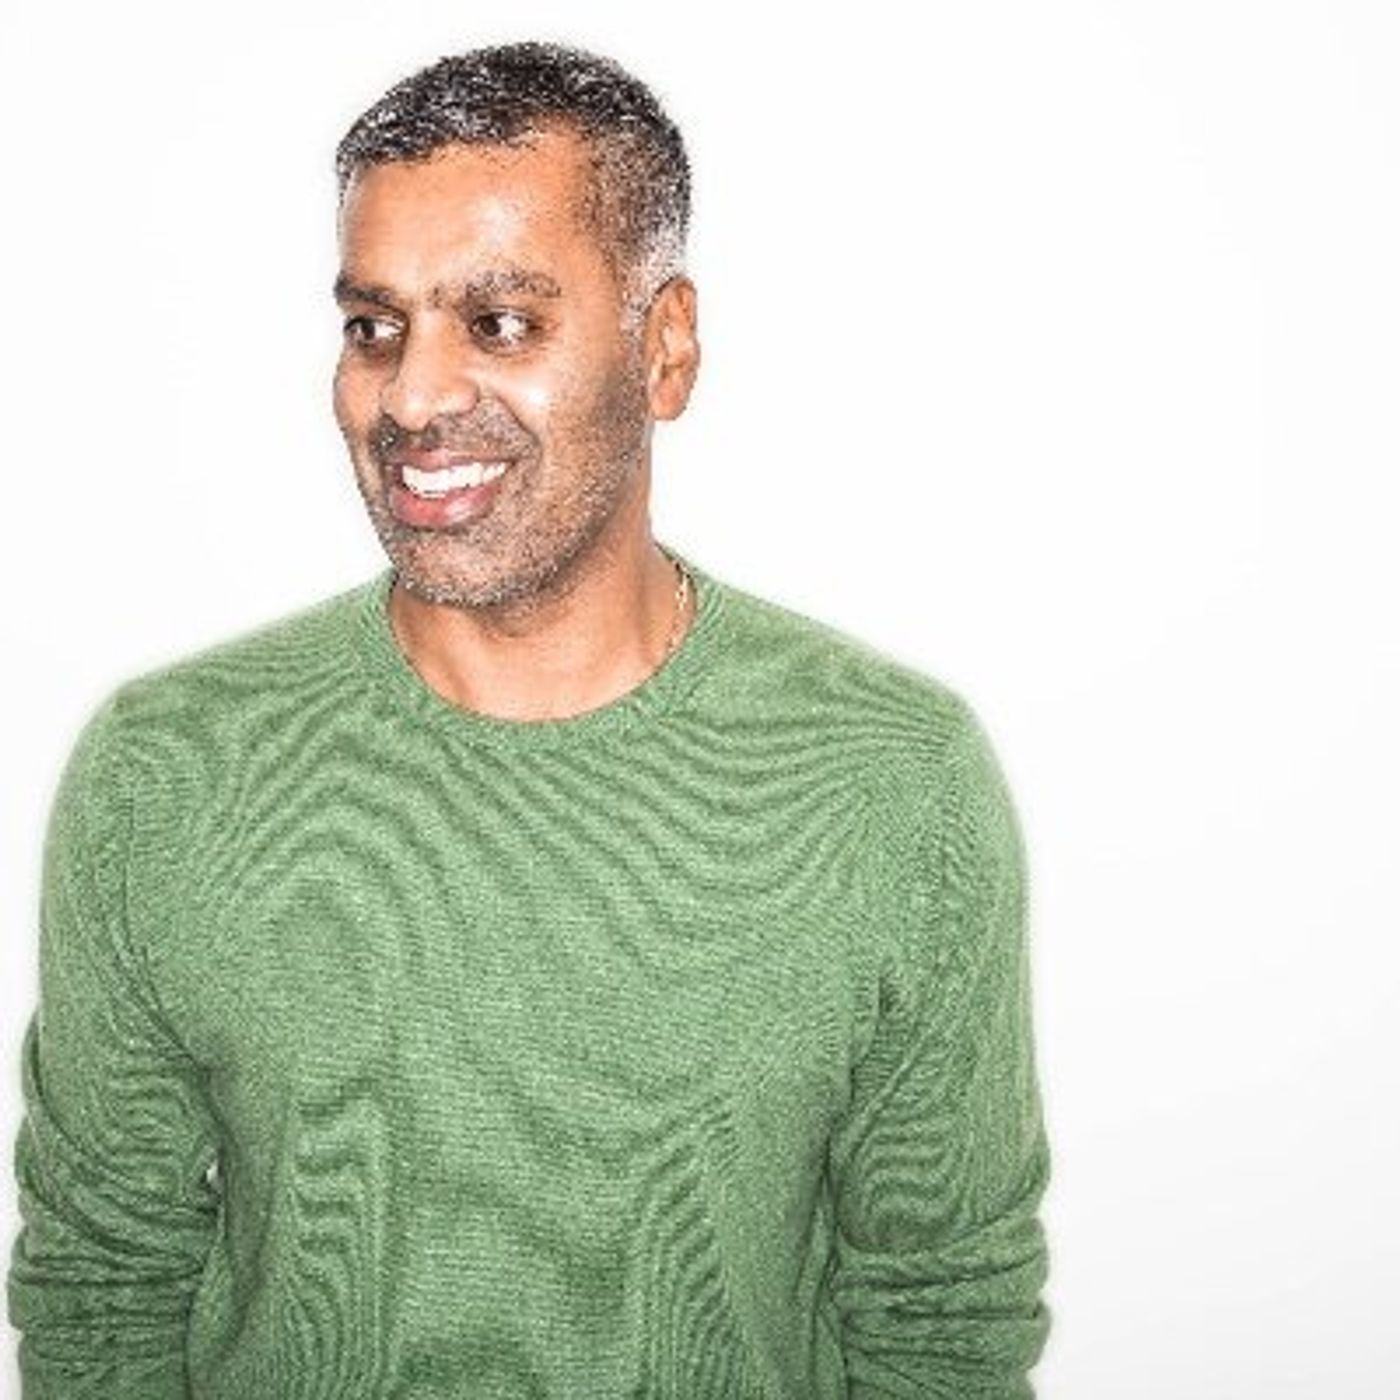 Interview with Professor Sudhir Venkatesh